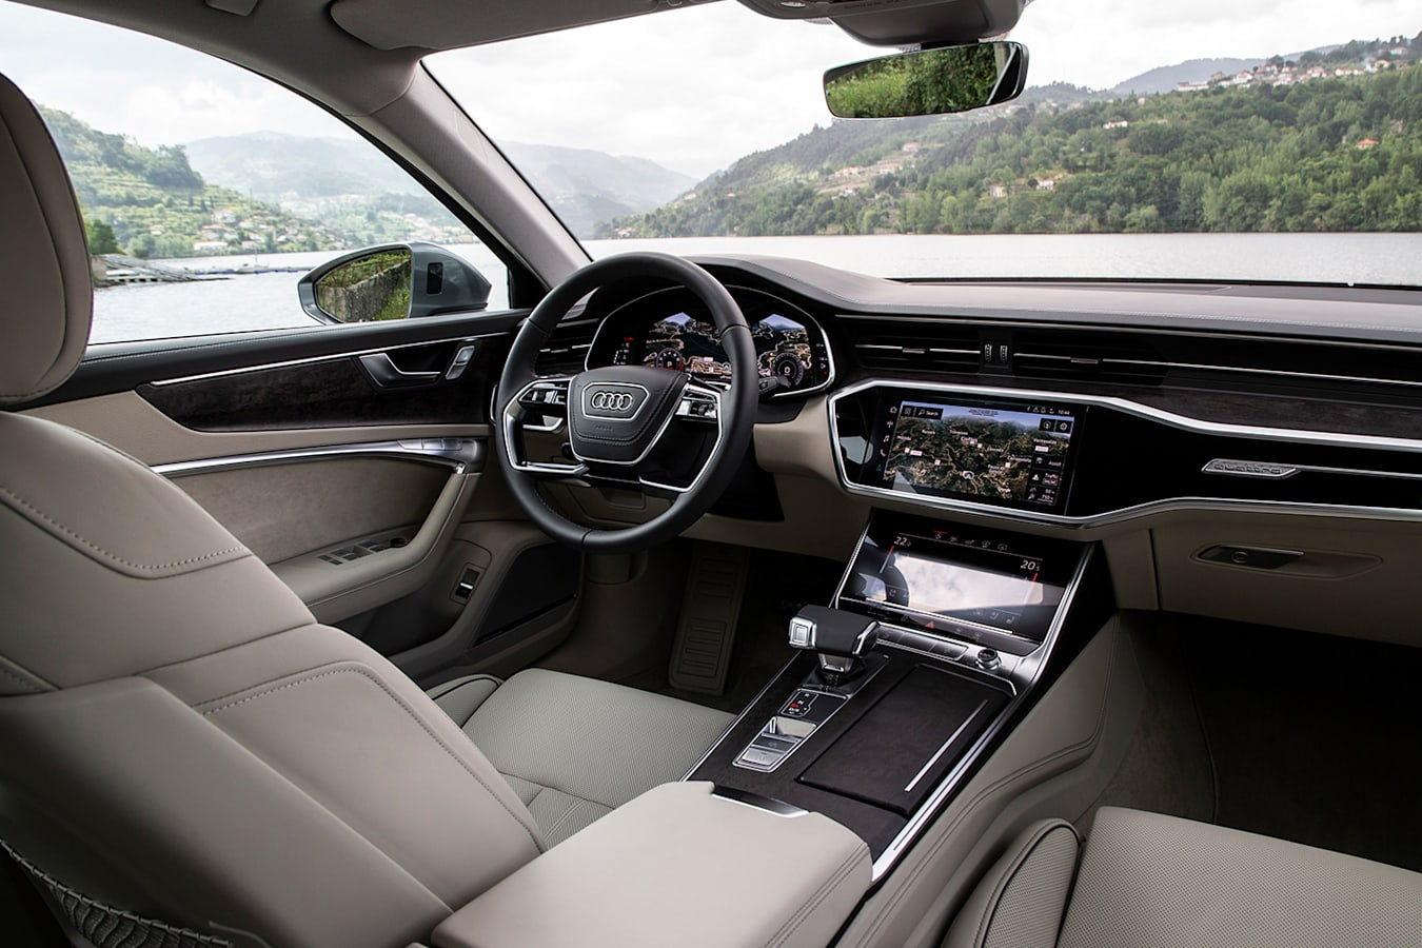 Audi A 6 Interior Lake Jpg